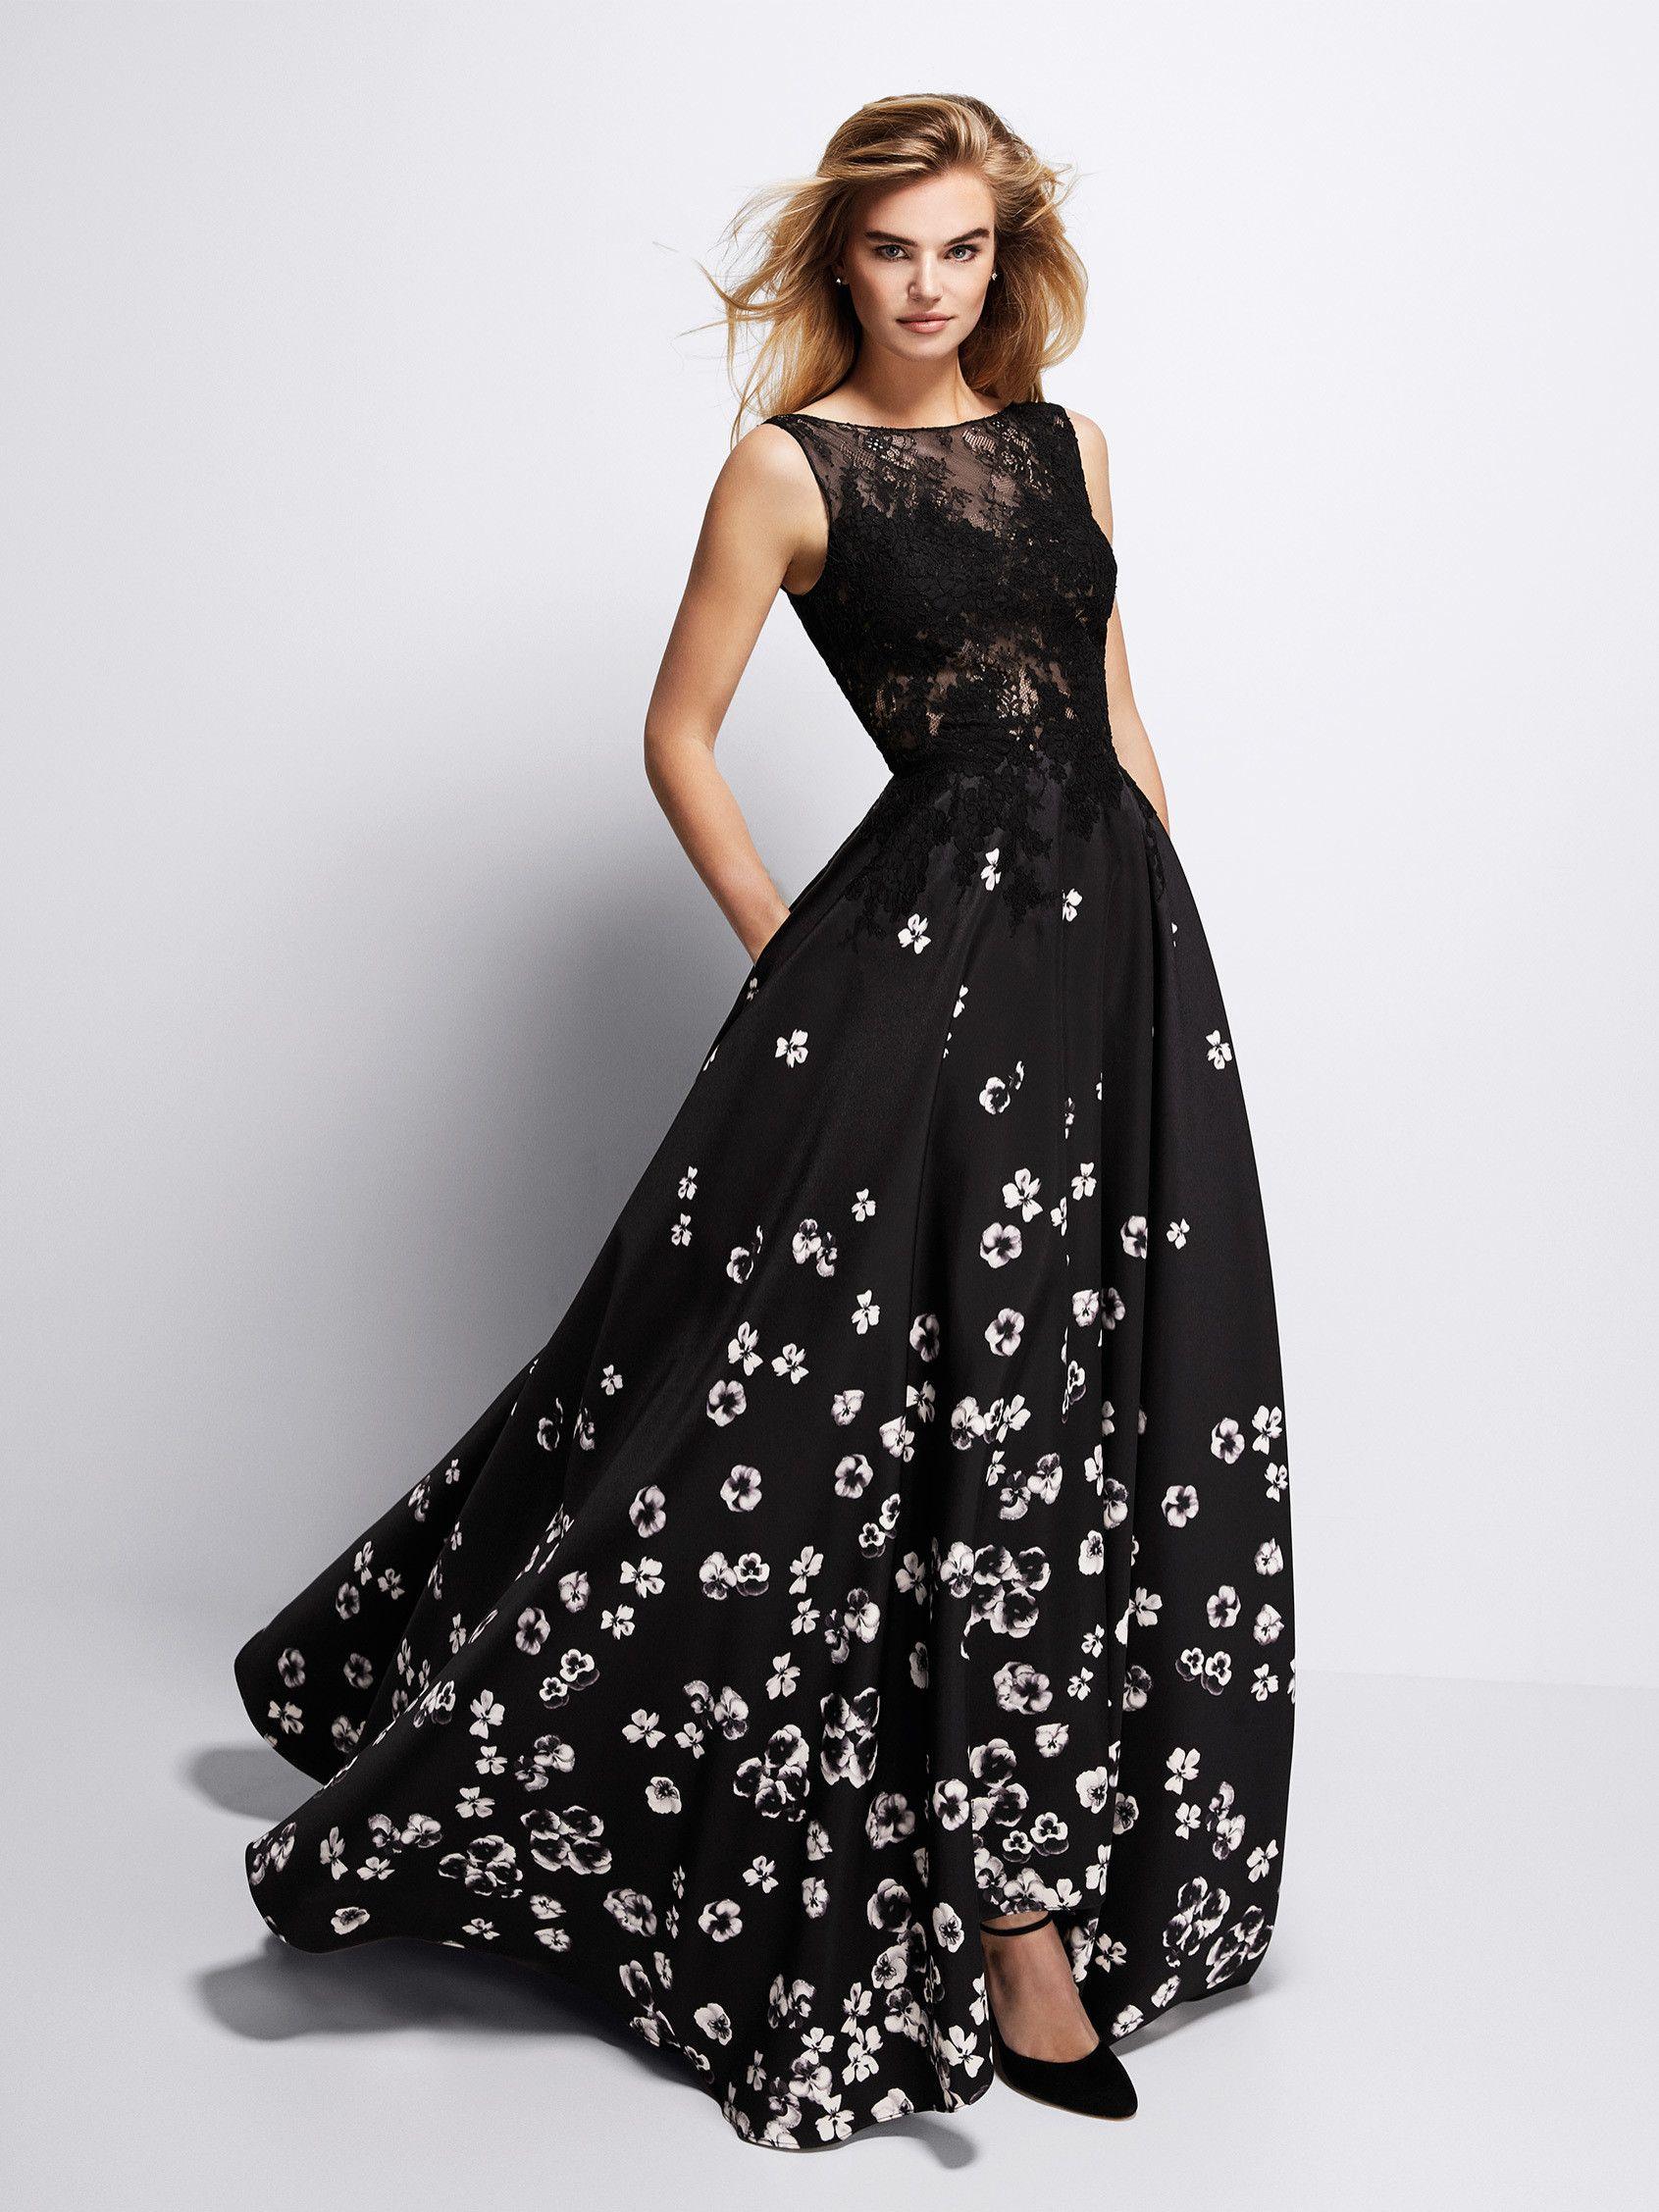 72e7de435b Vestido de fiesta negro con flores blancas - Colección fiesta 2018 Pronovias